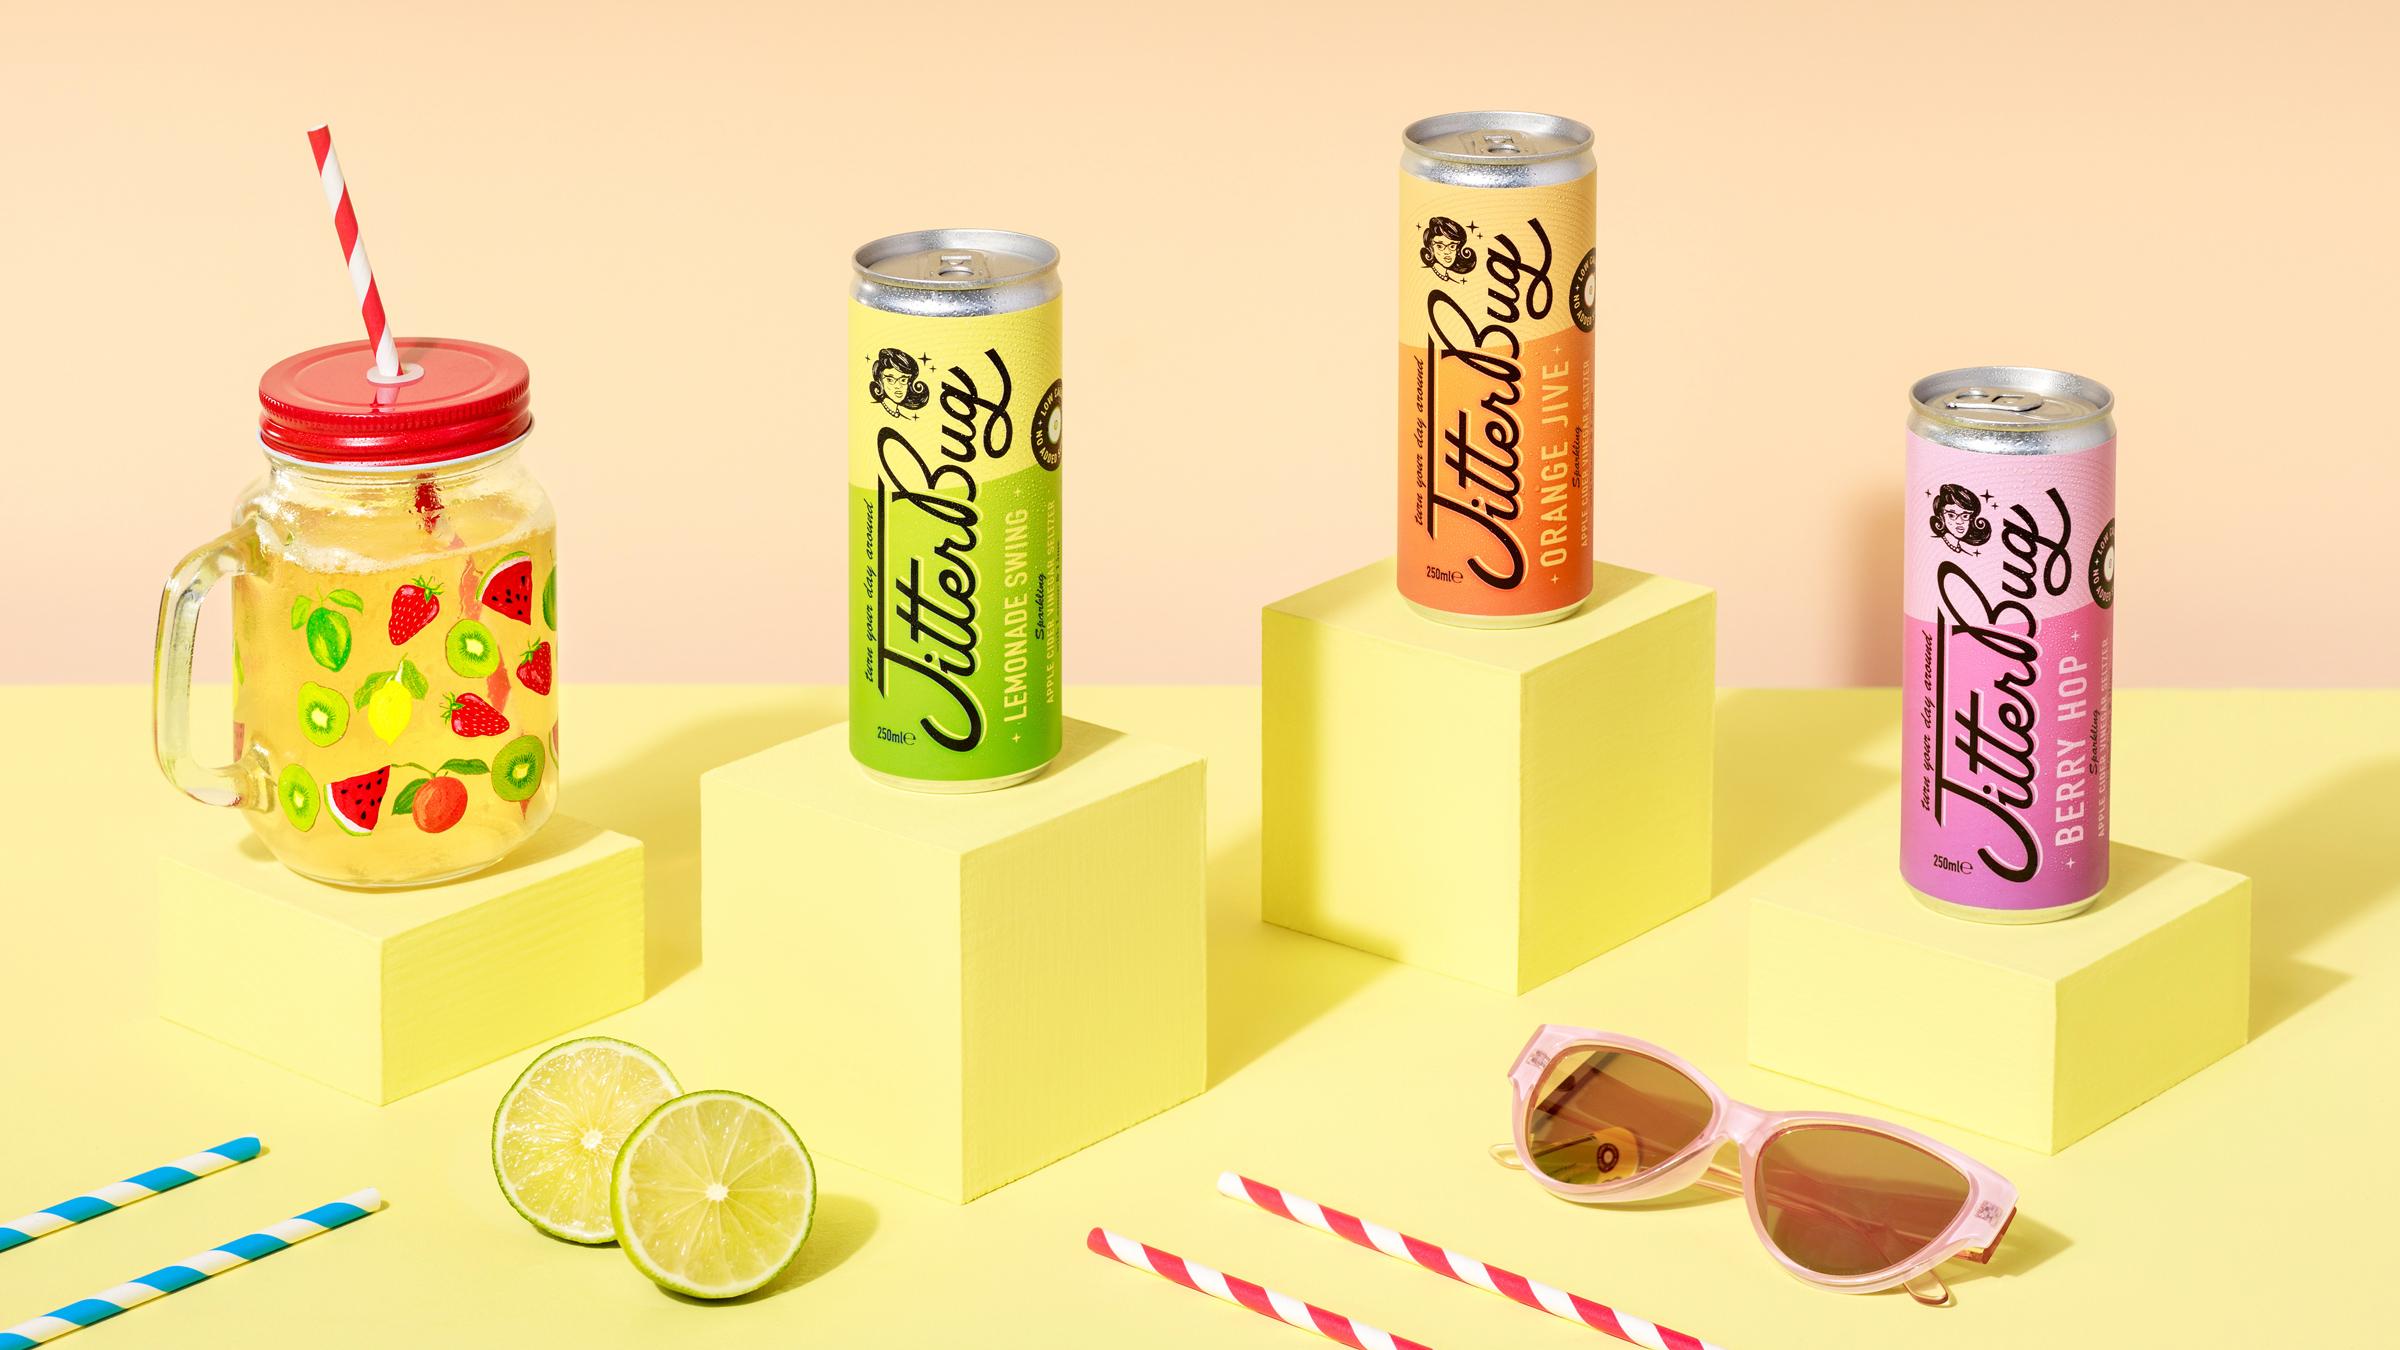 Kingdom & Sparrow Create Branding for Gut Health Brand Jitterbug